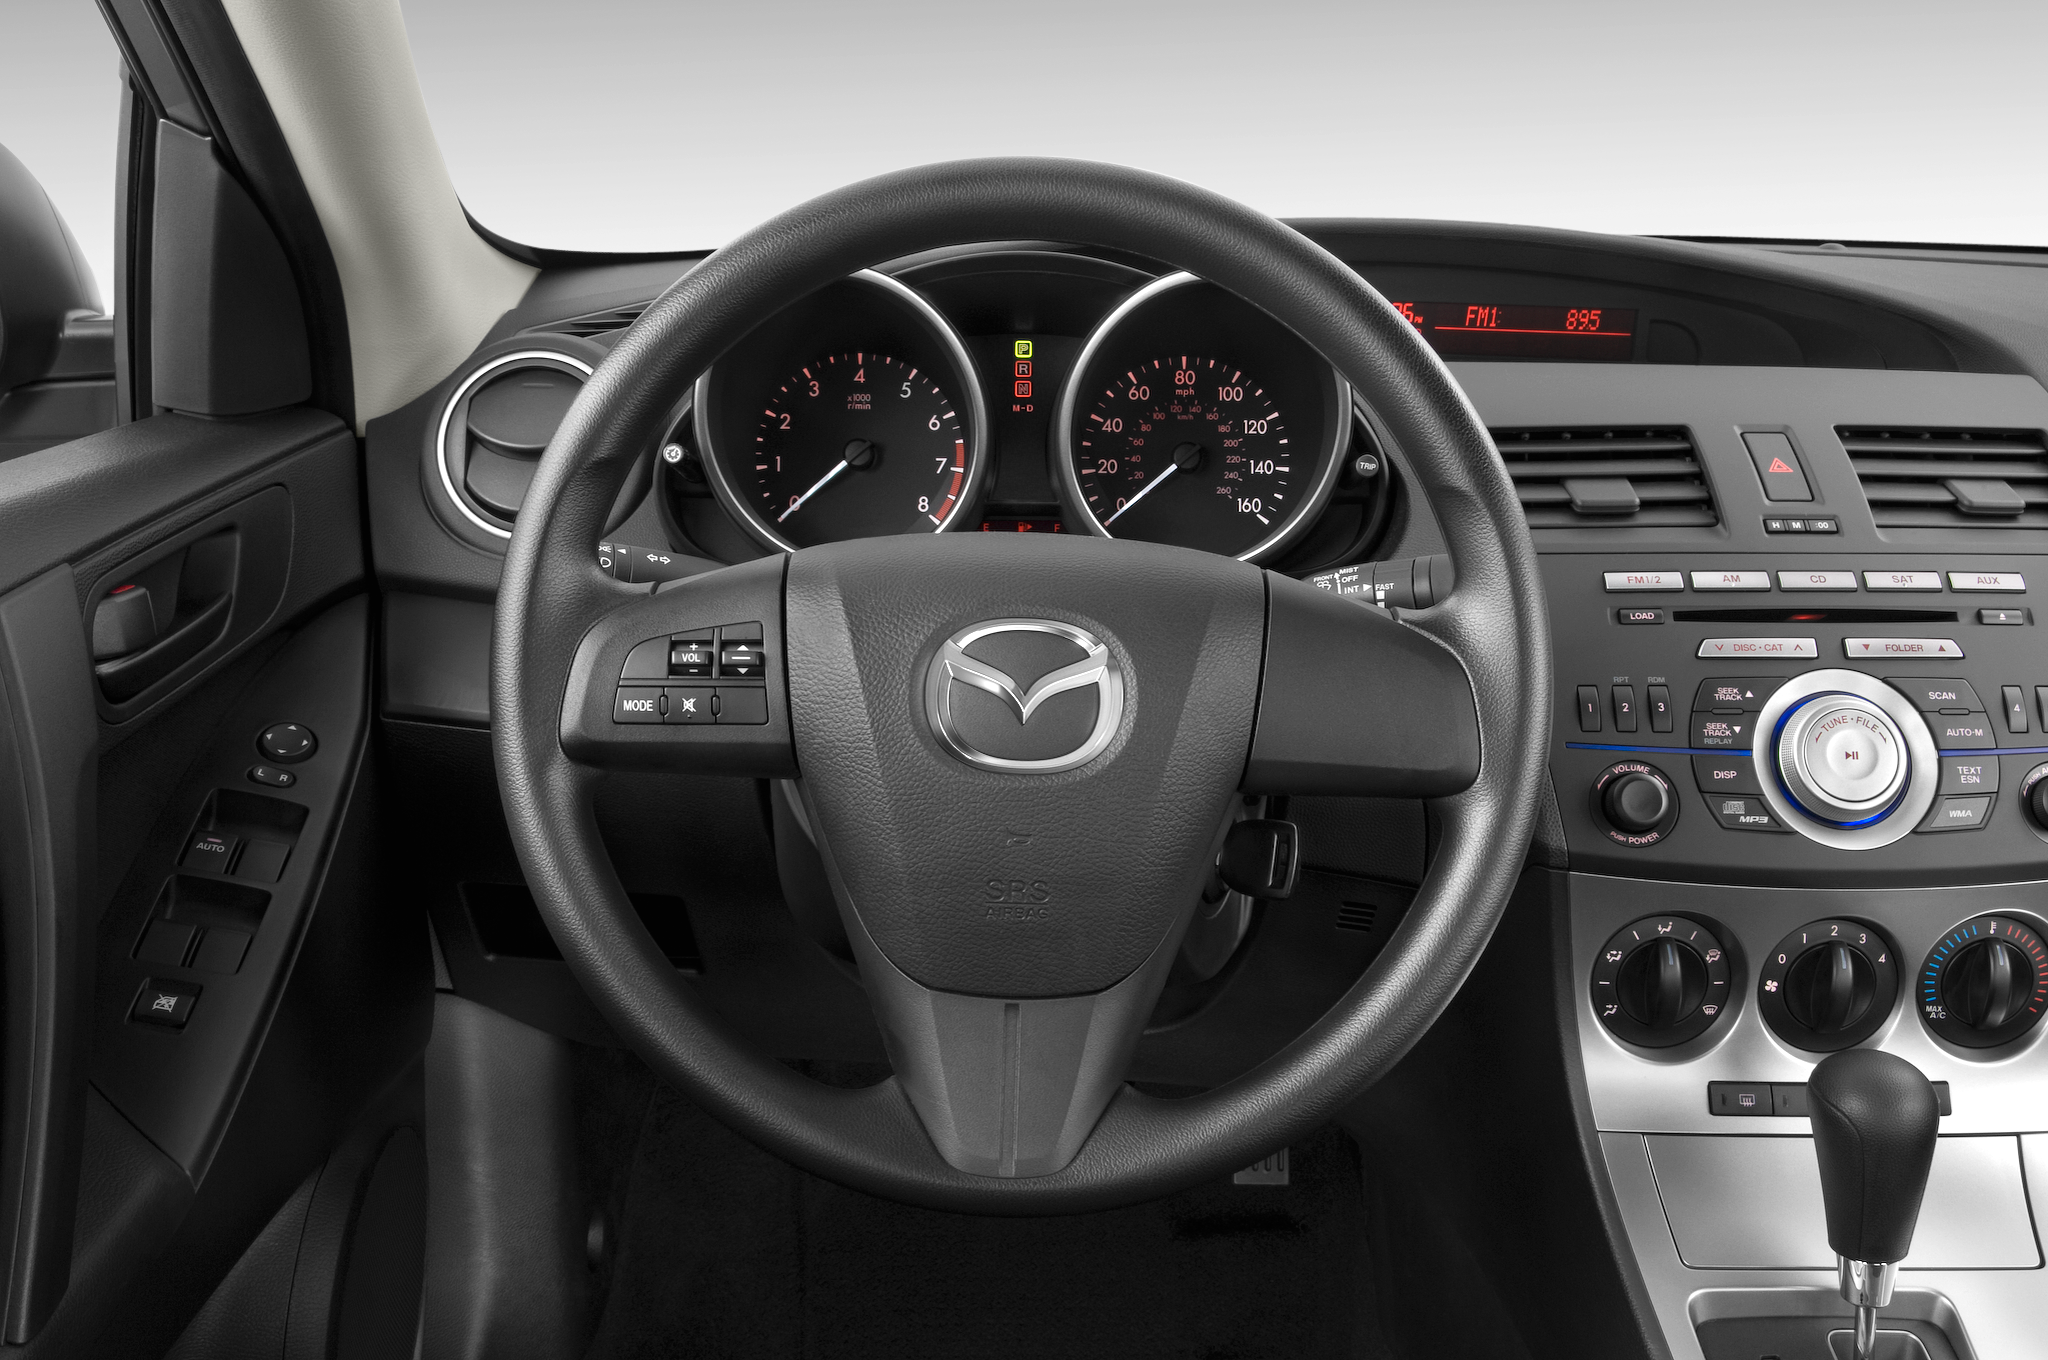 http://st.automobilemag.com/uploads/sites/10/2015/11/2010-mazda-mazda3-i-sport-4-door-sedan-steering-wheel.png